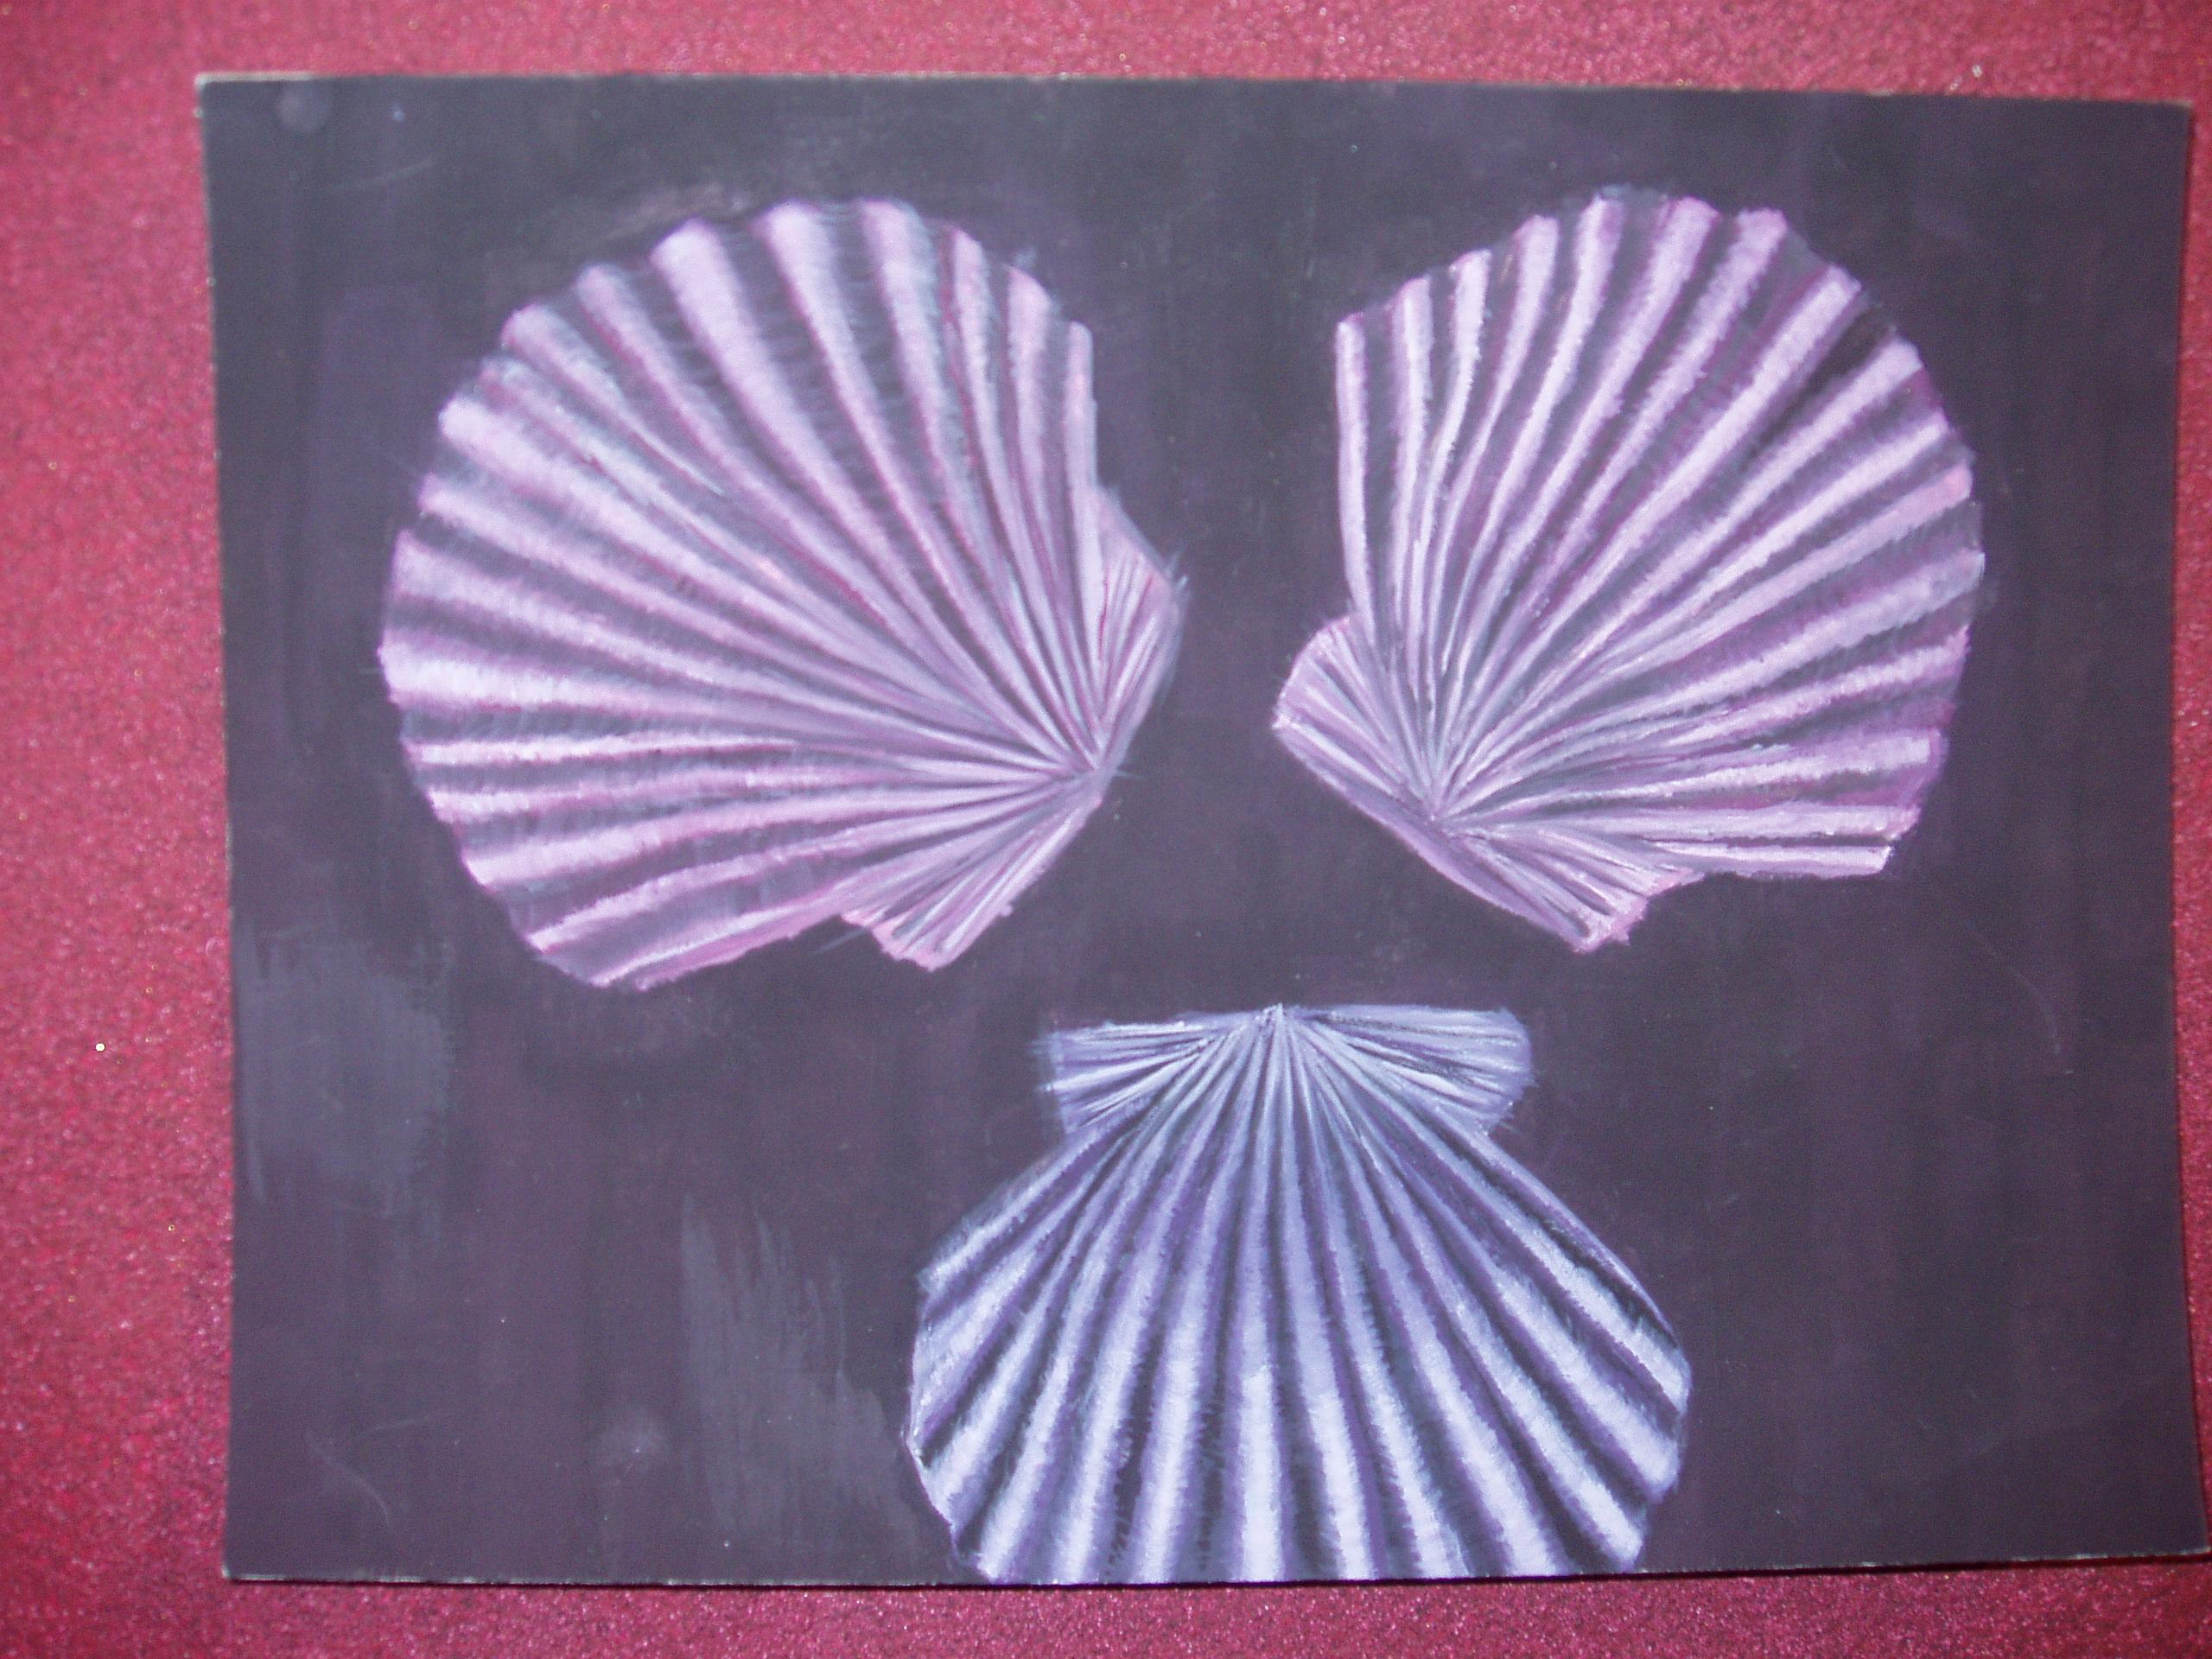 Sea shell still life by DarknessEternity1027